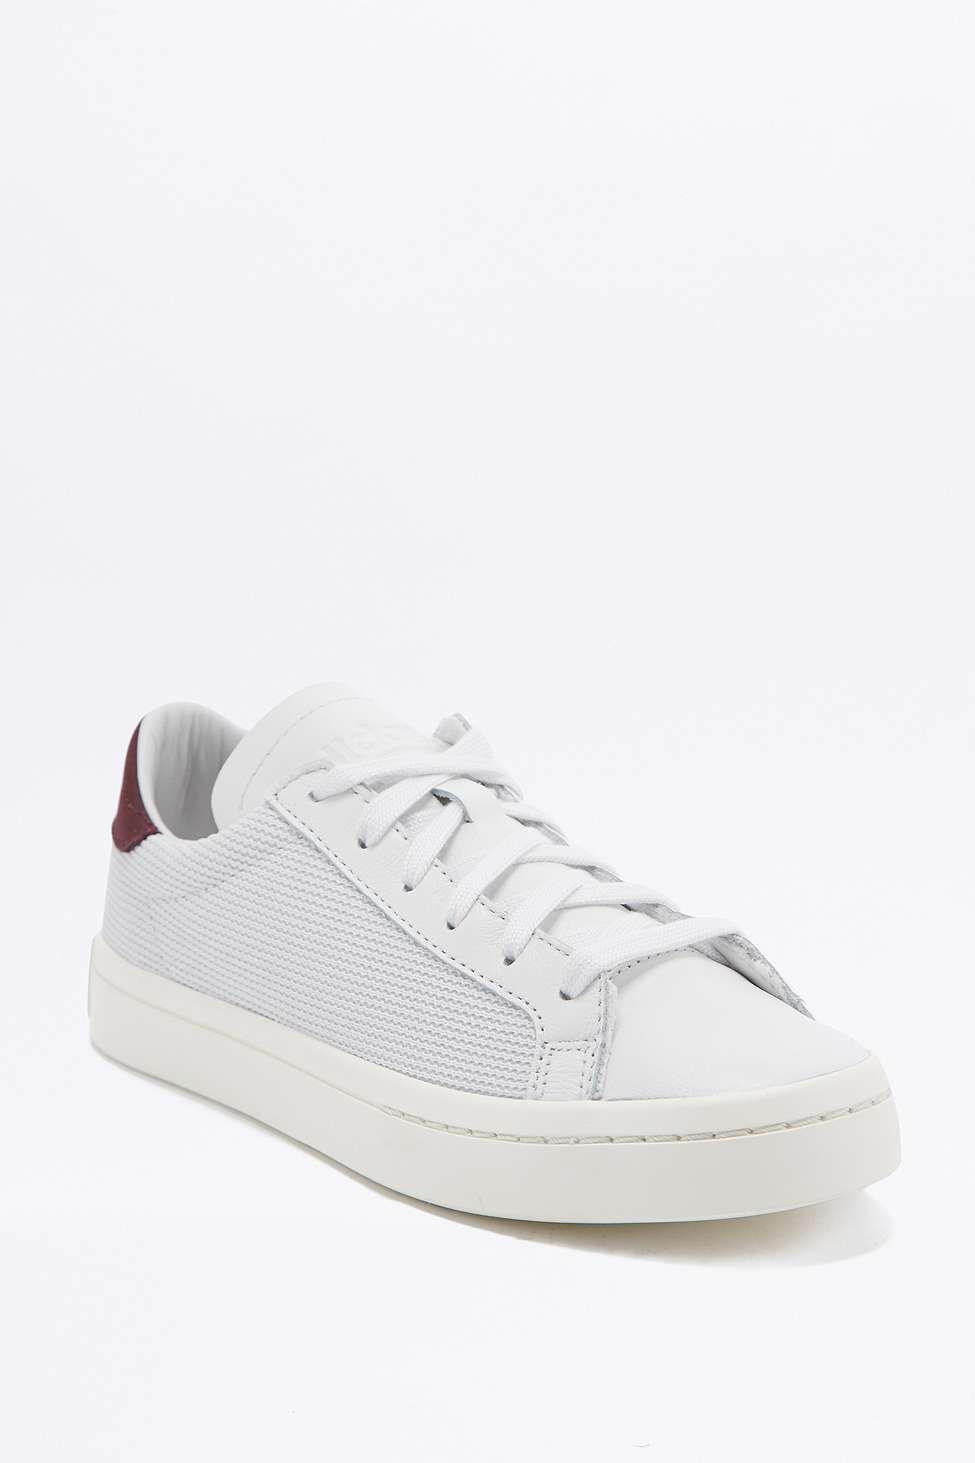 adidas Originals Court Vantage White and Burgundy Trainers